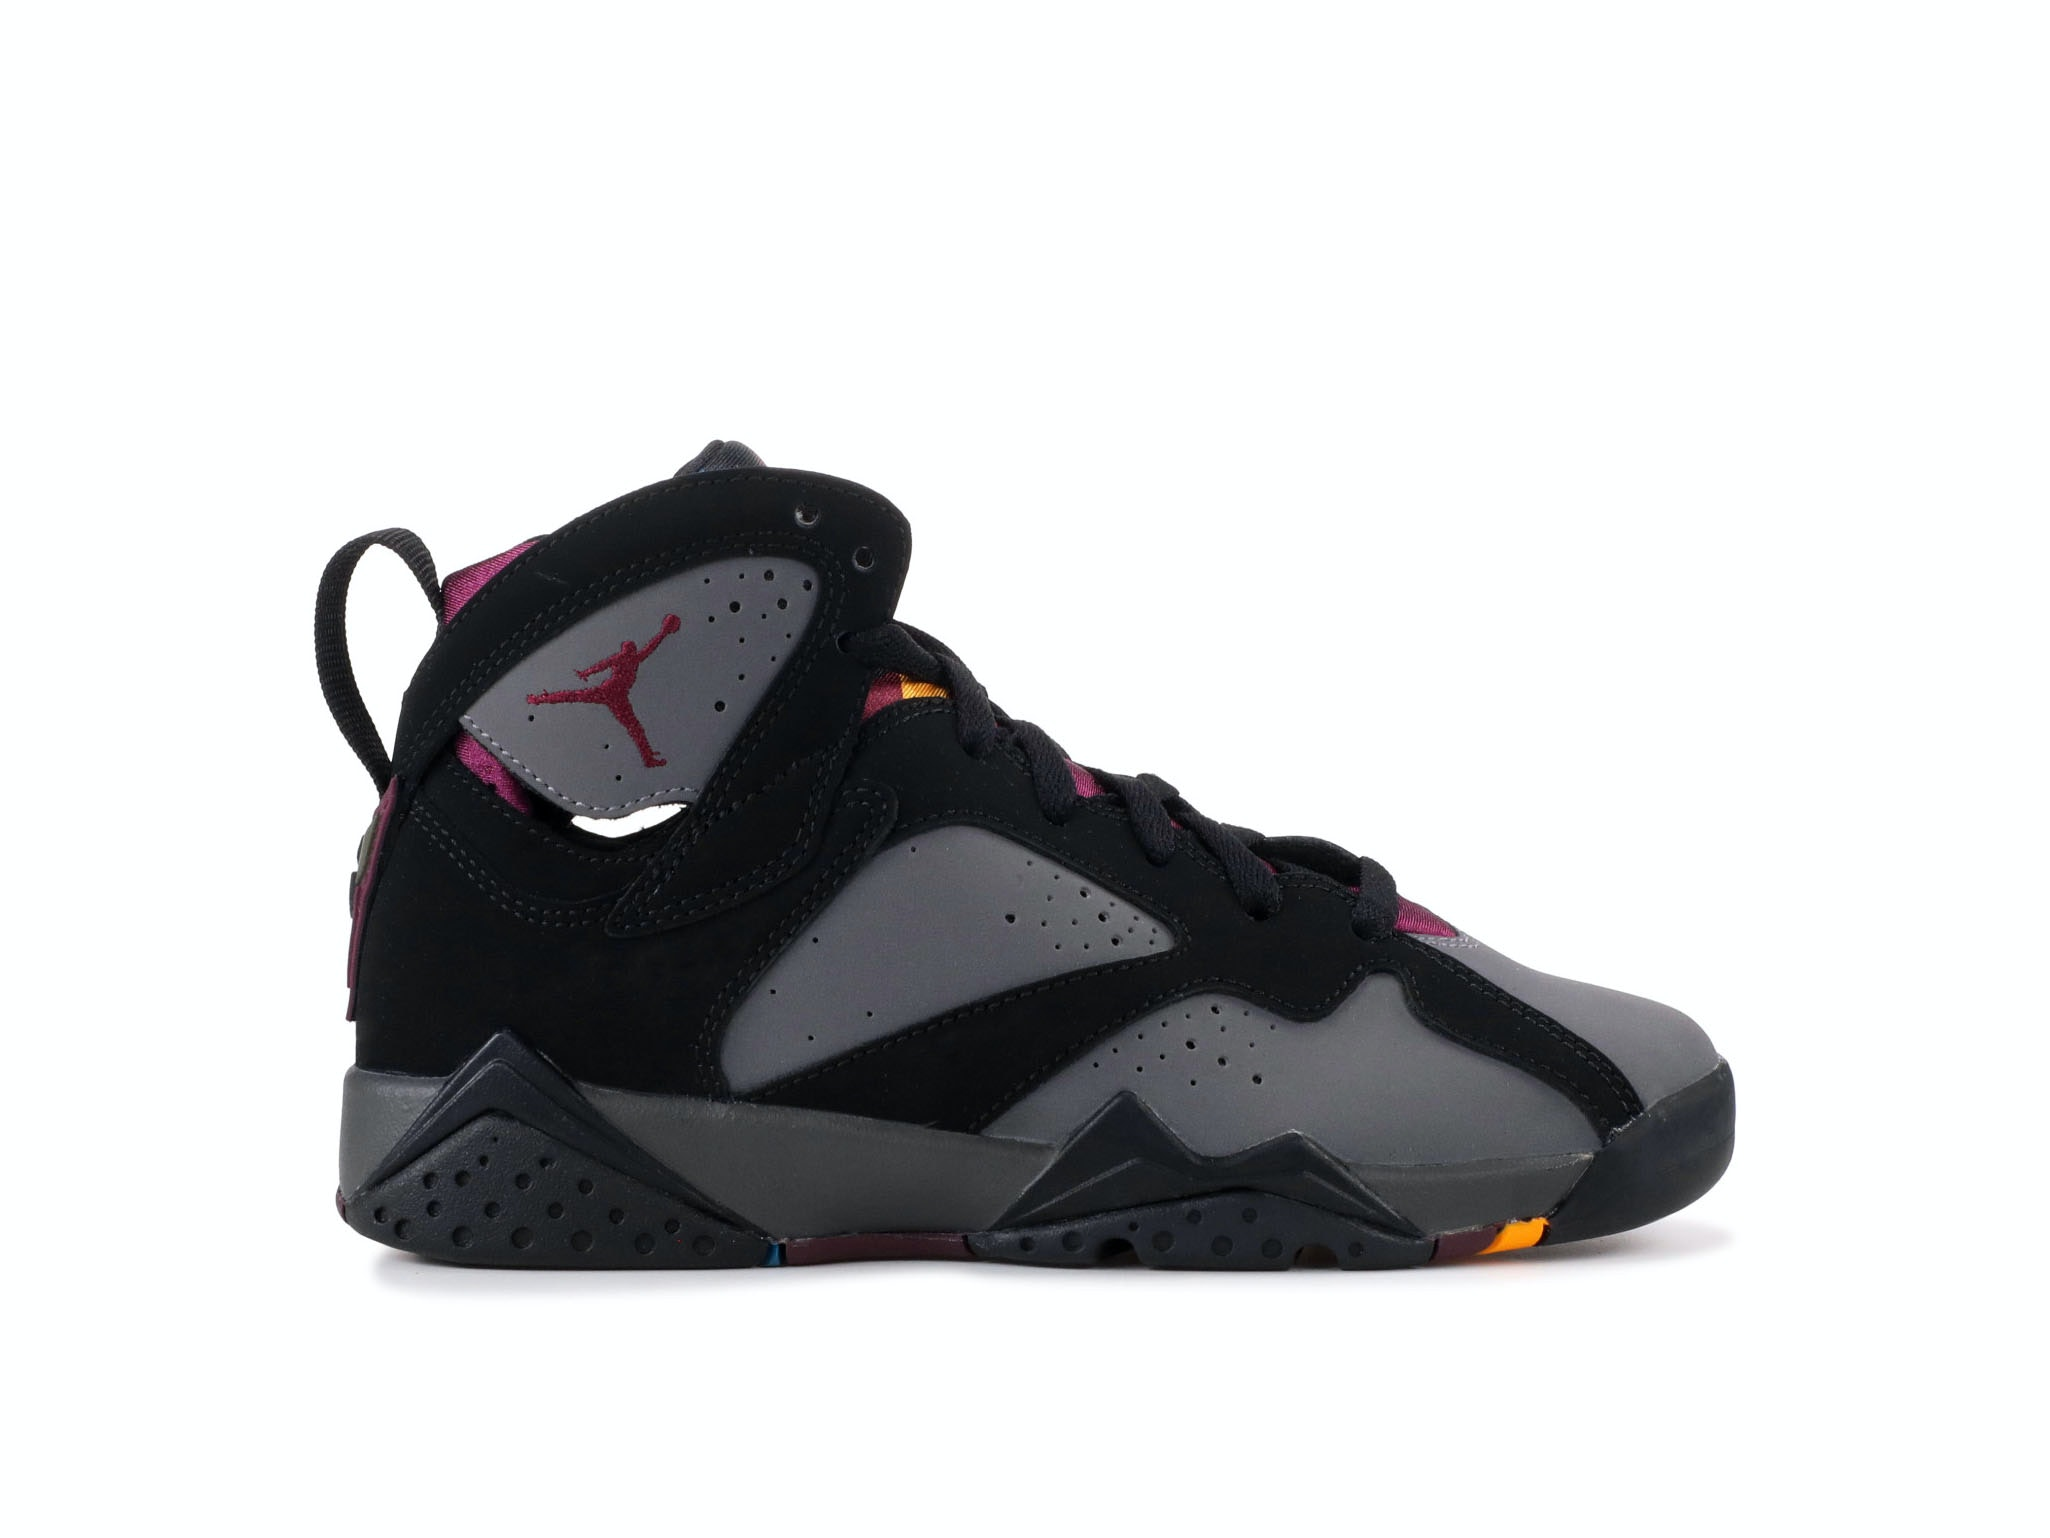 68500f96893bb1 Shop Air Jordan 7 Retro BG Bordeaux 2015 Online